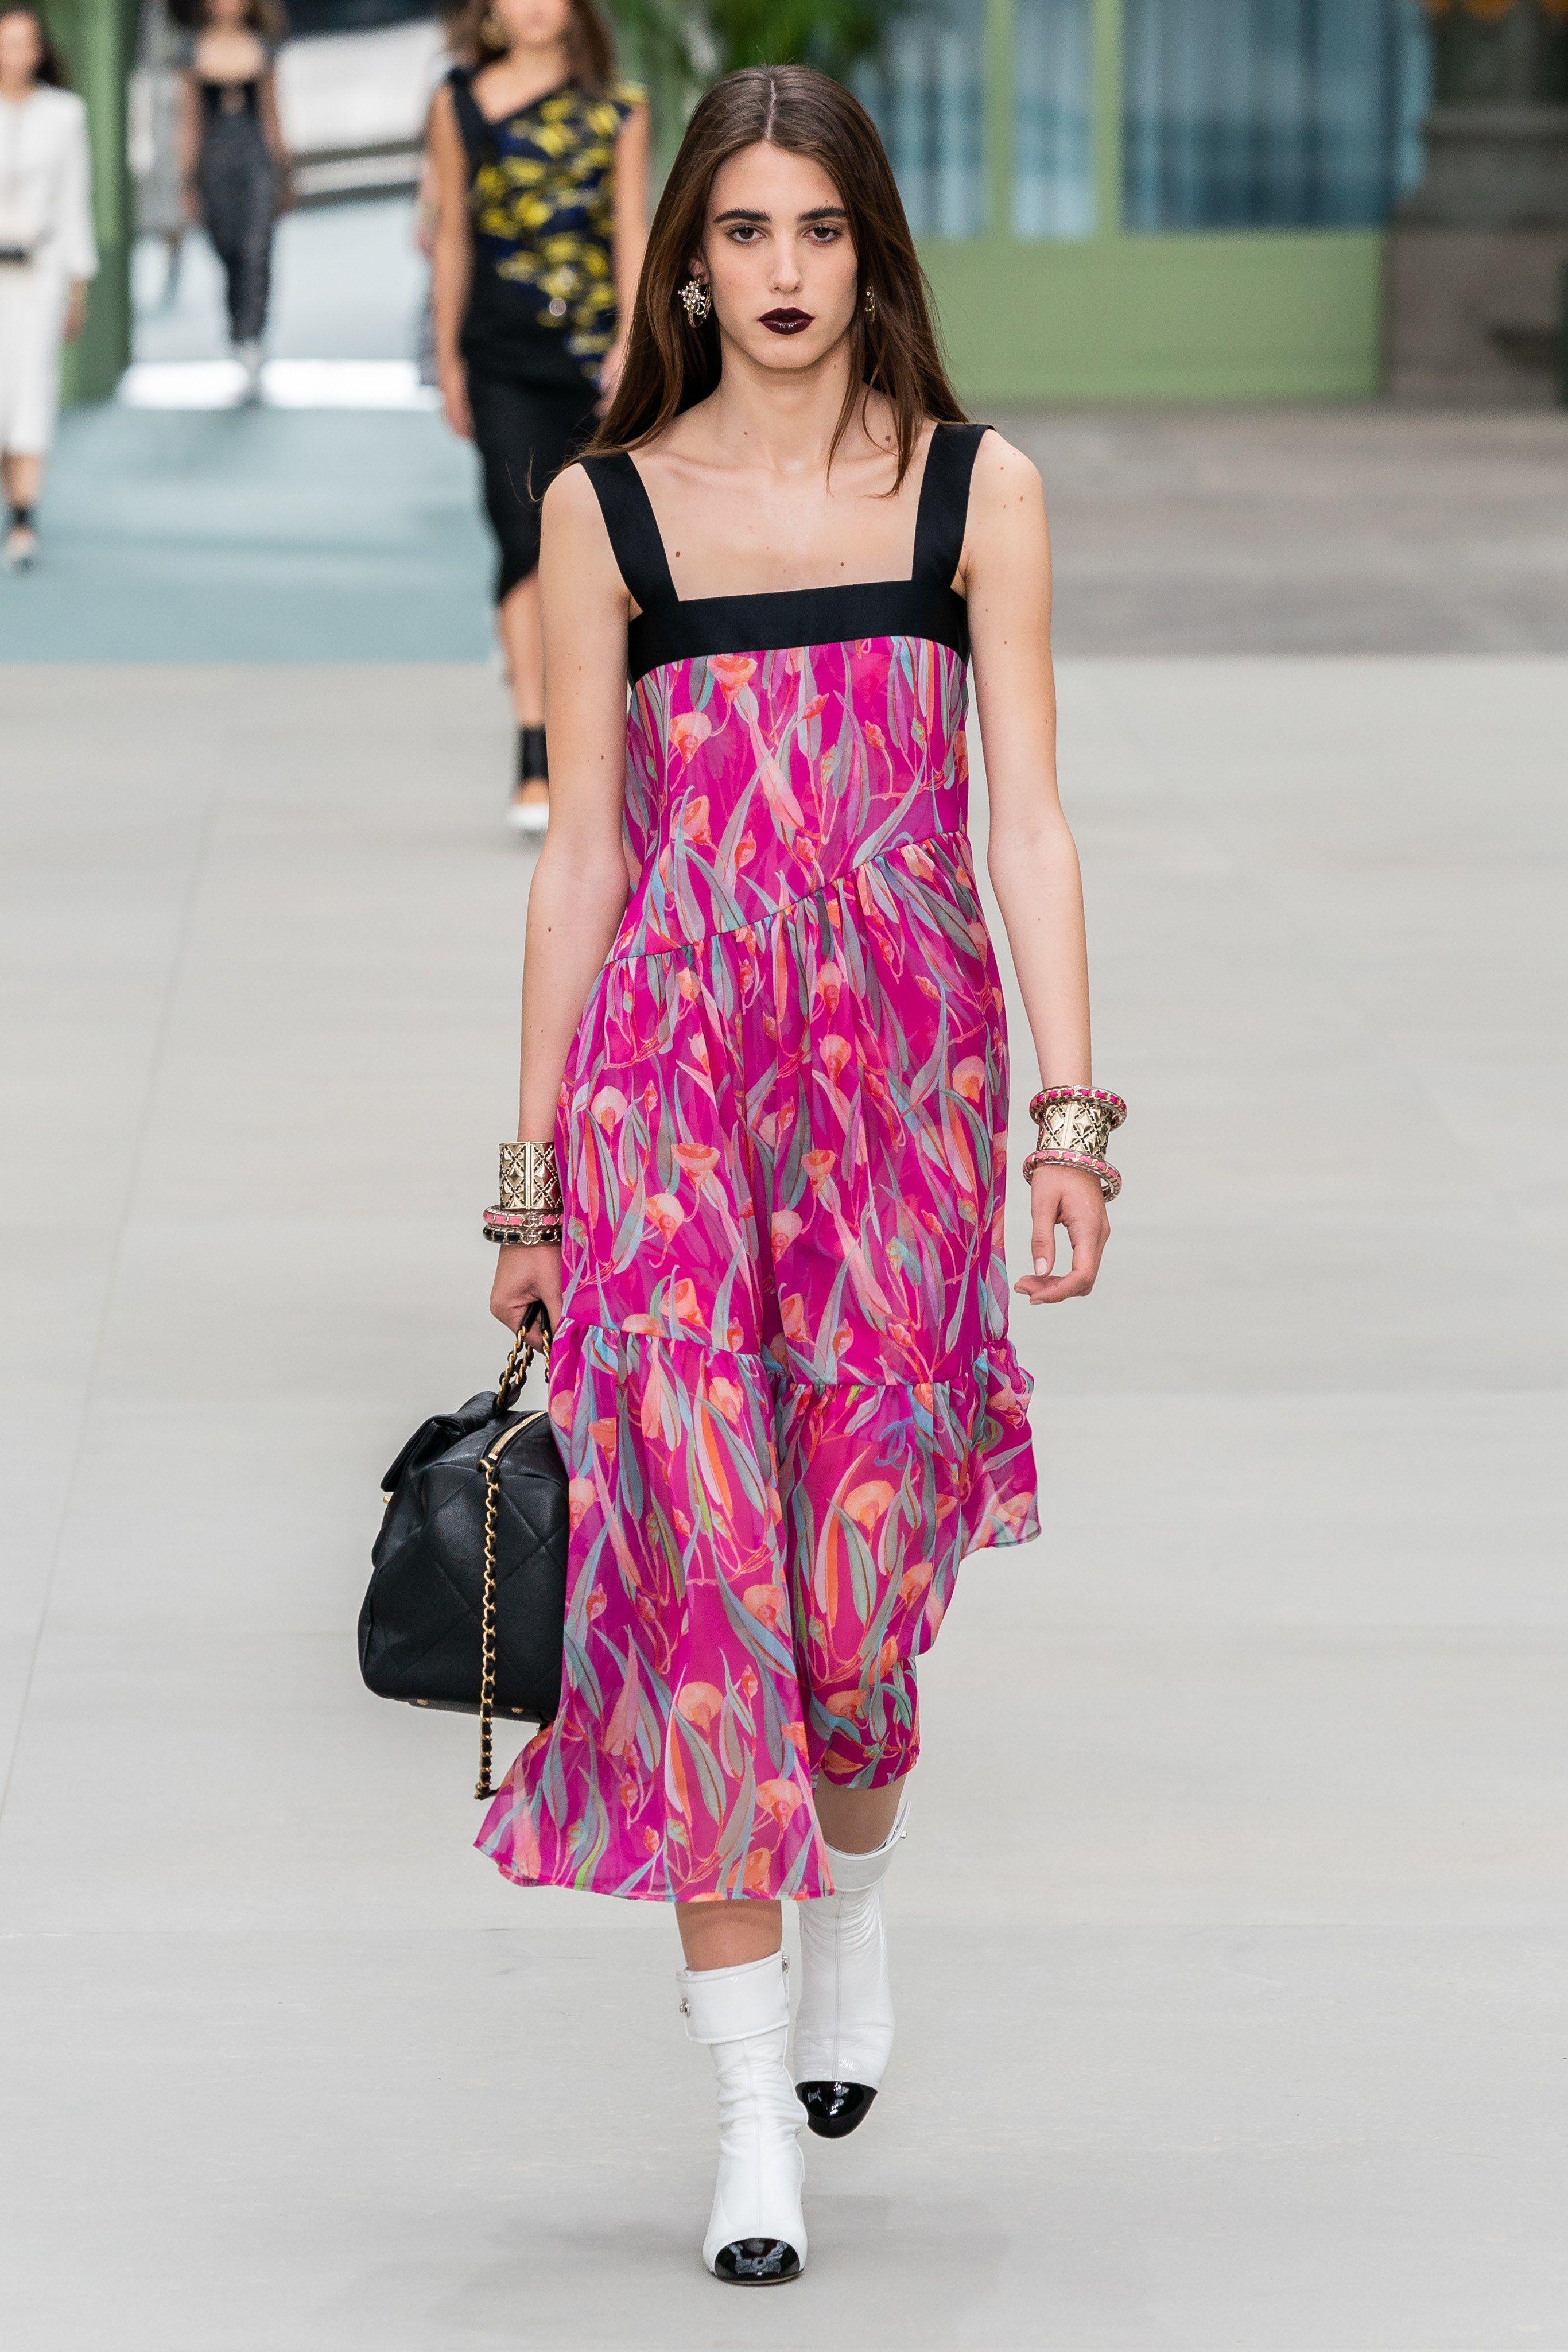 Chanel Resort 2020 Fashion Show Fashion, Chanel resort